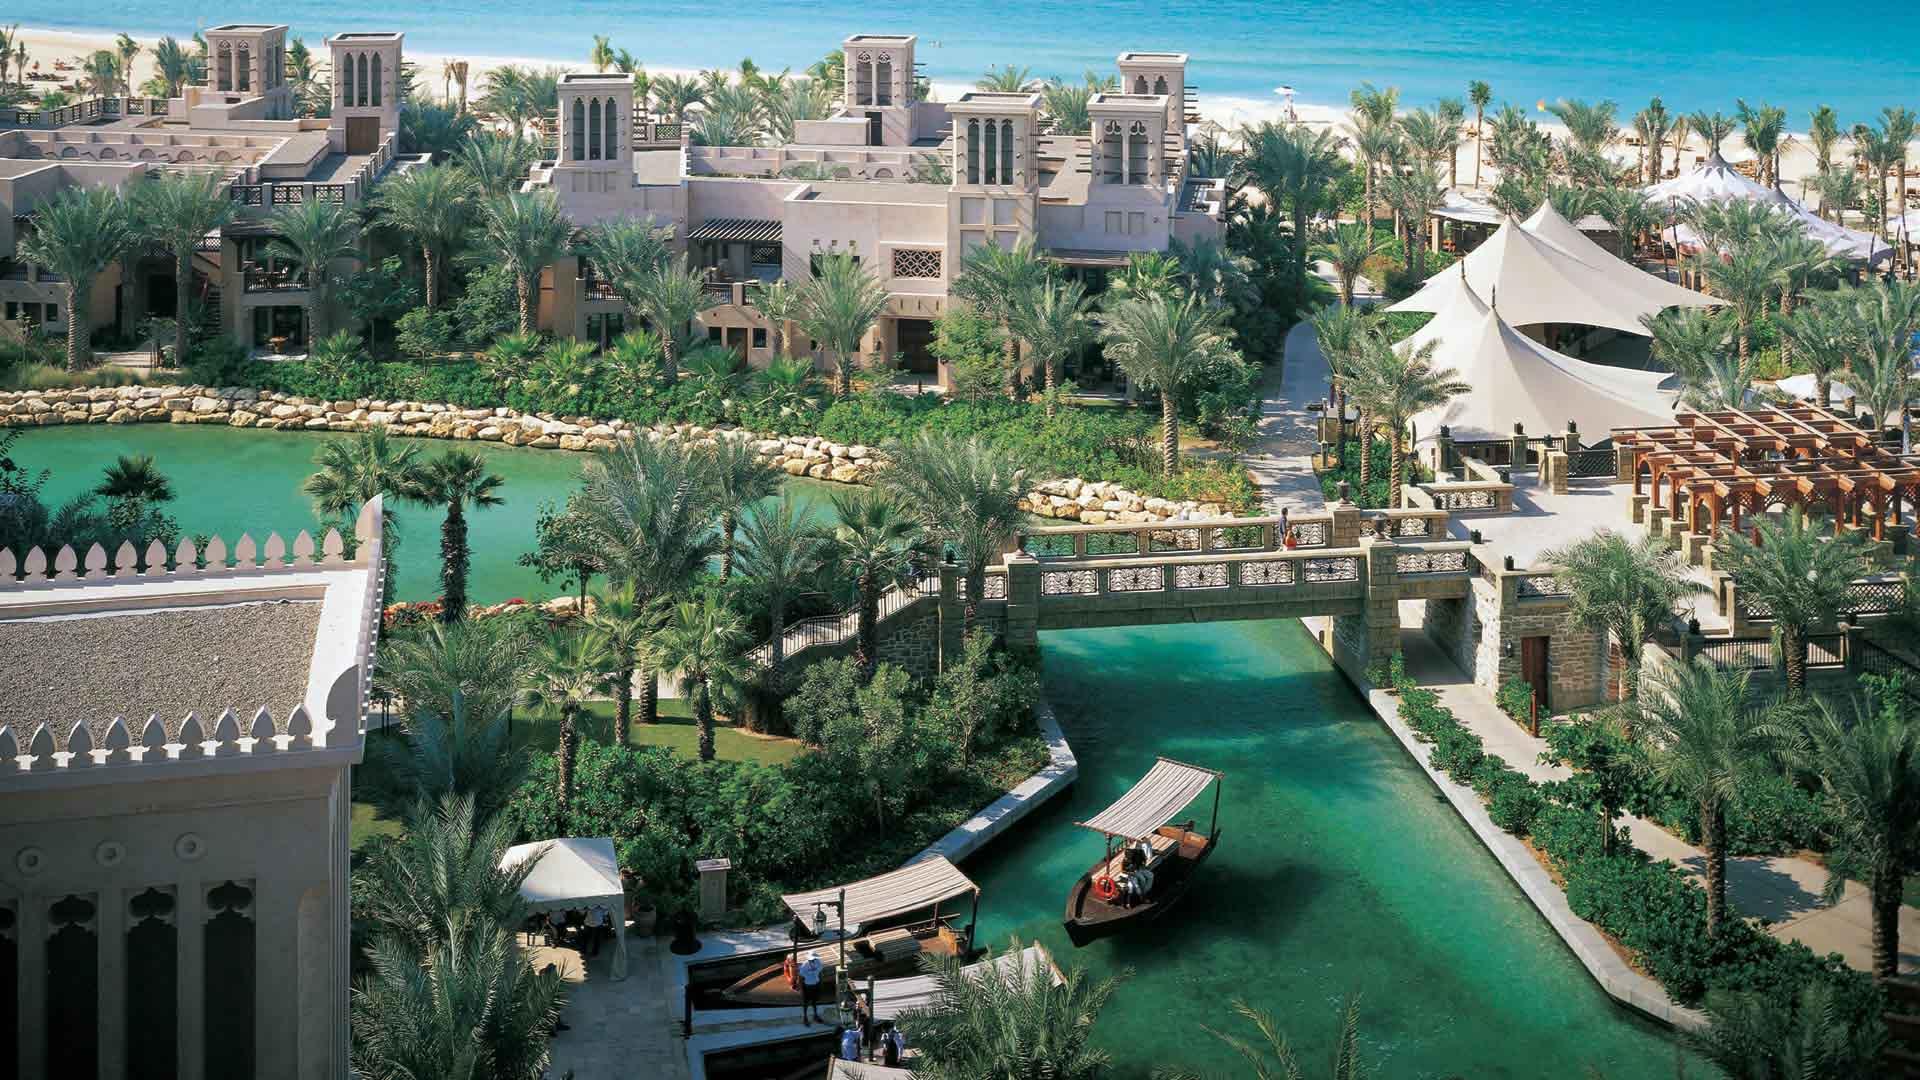 Madinat Jumeirah waterways